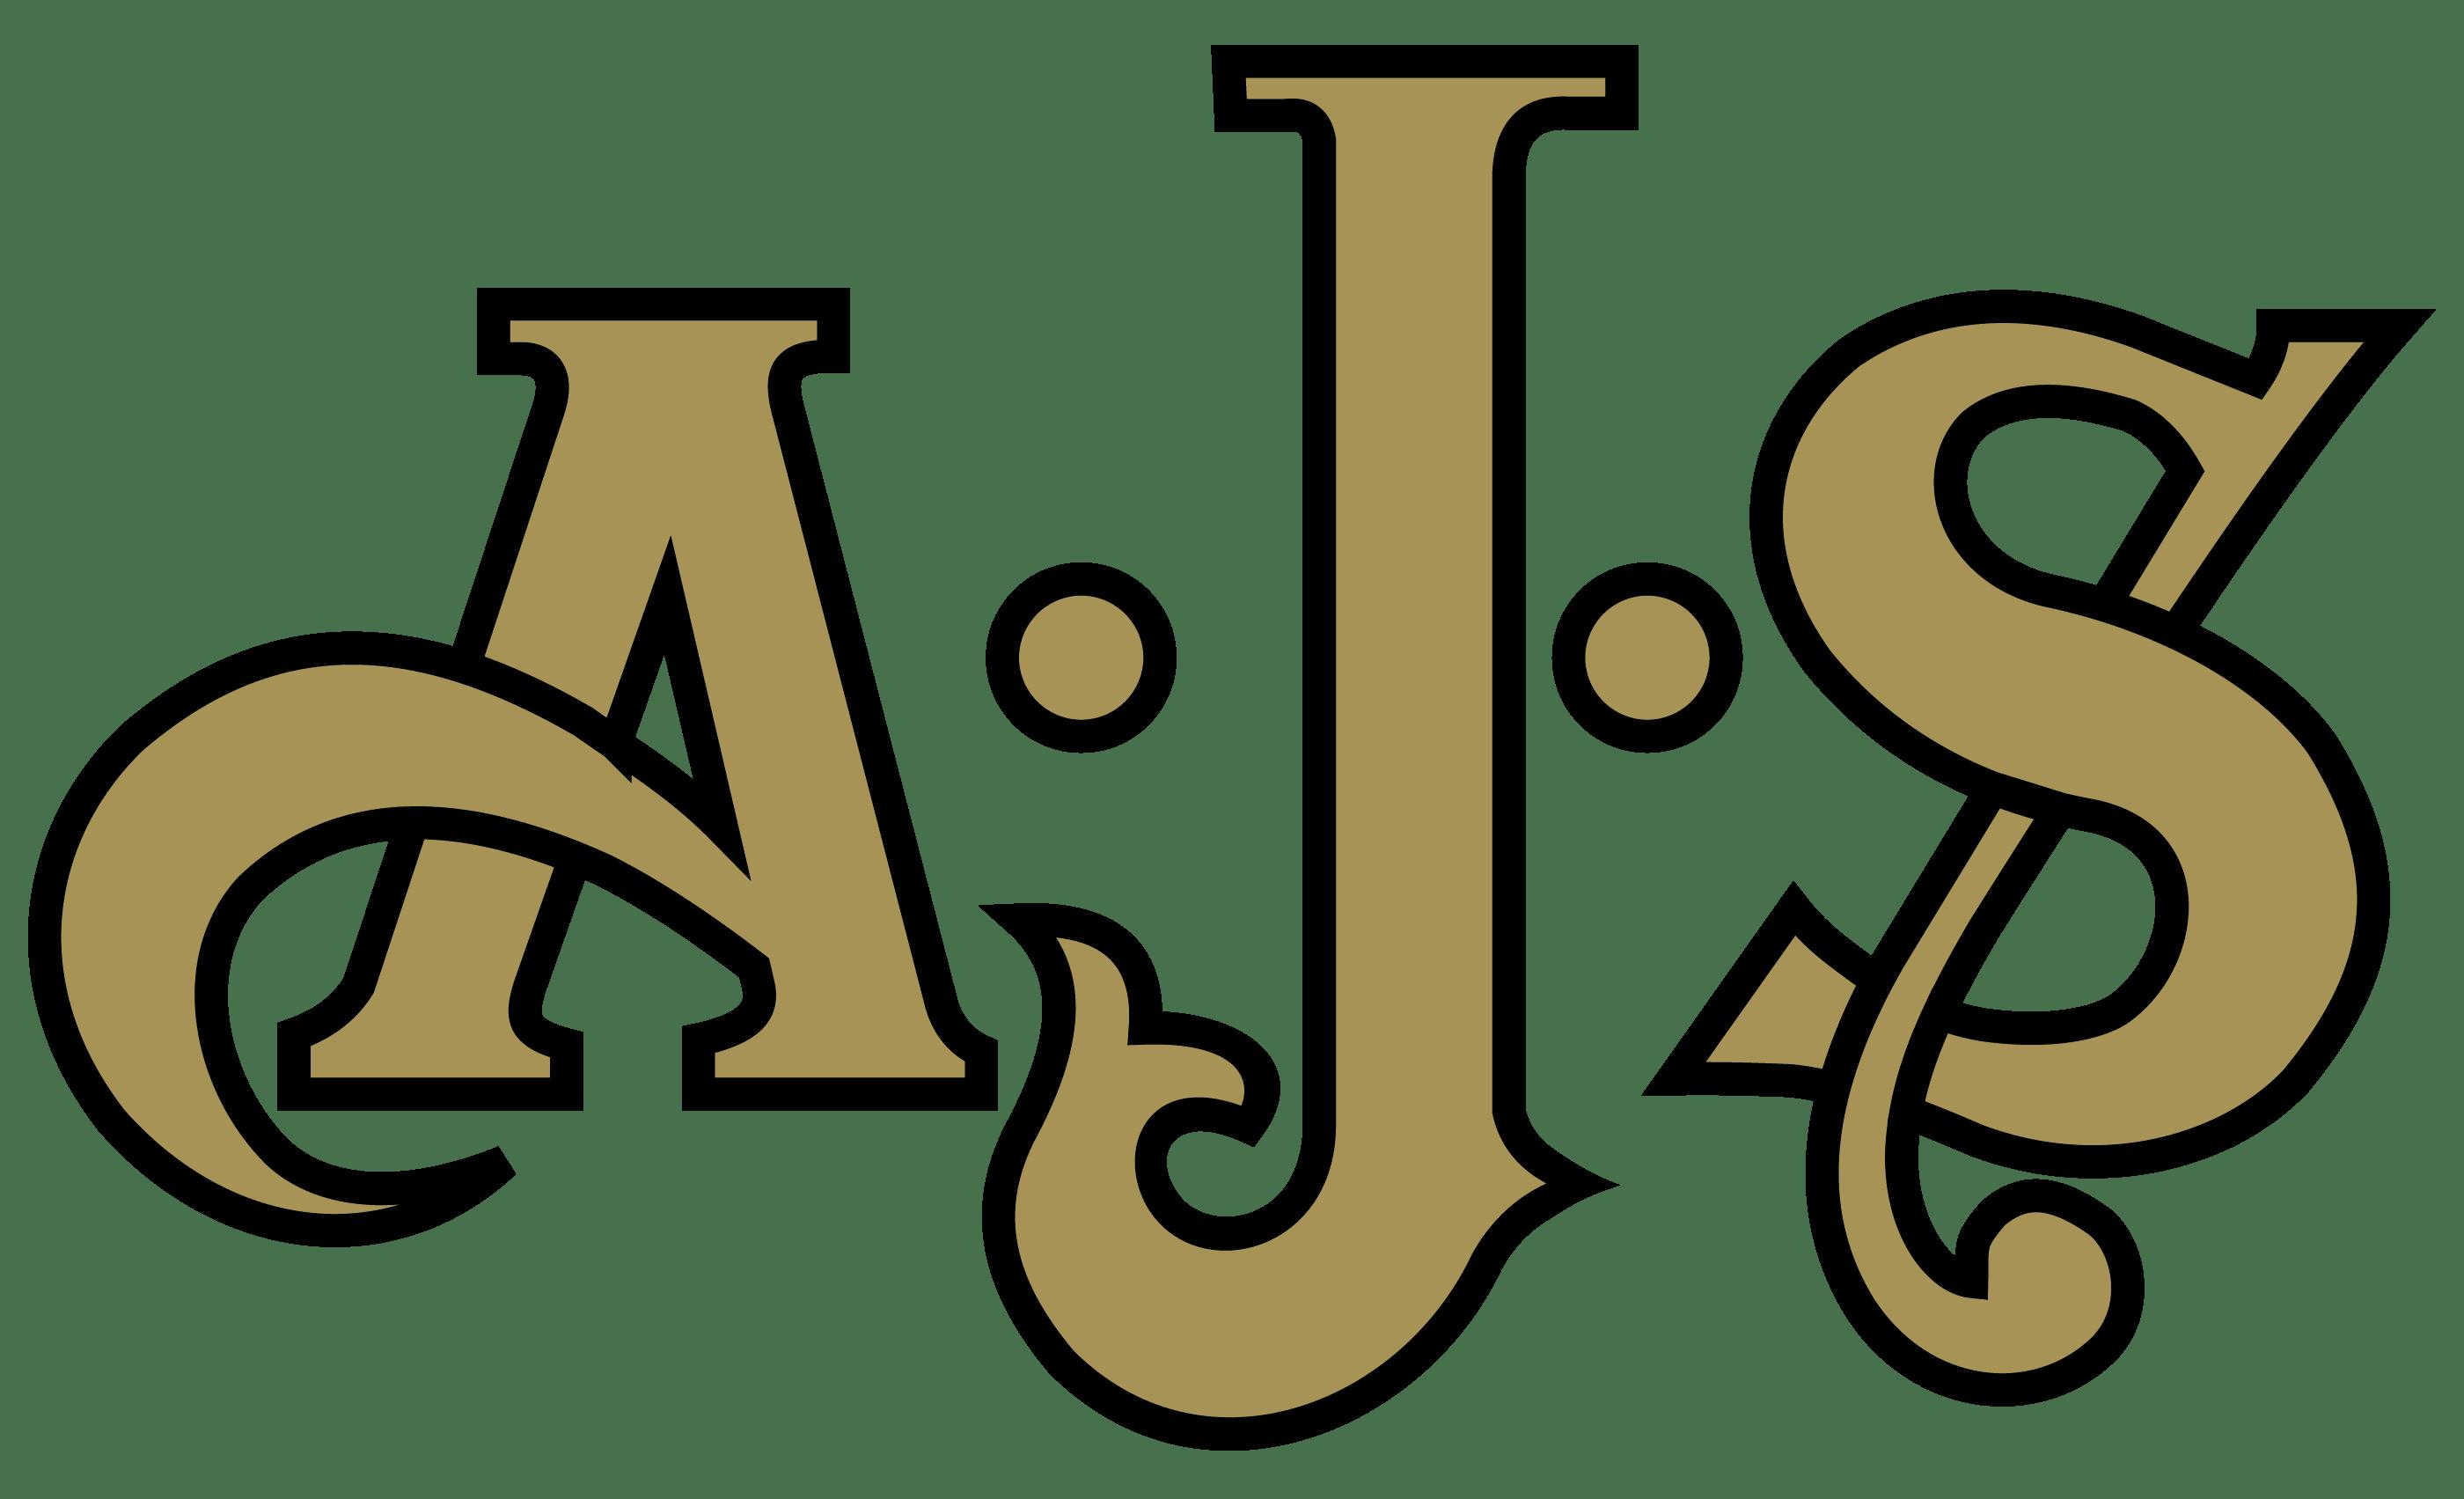 AJS Logo - Ajs Motorcycles Logo Vector PNG